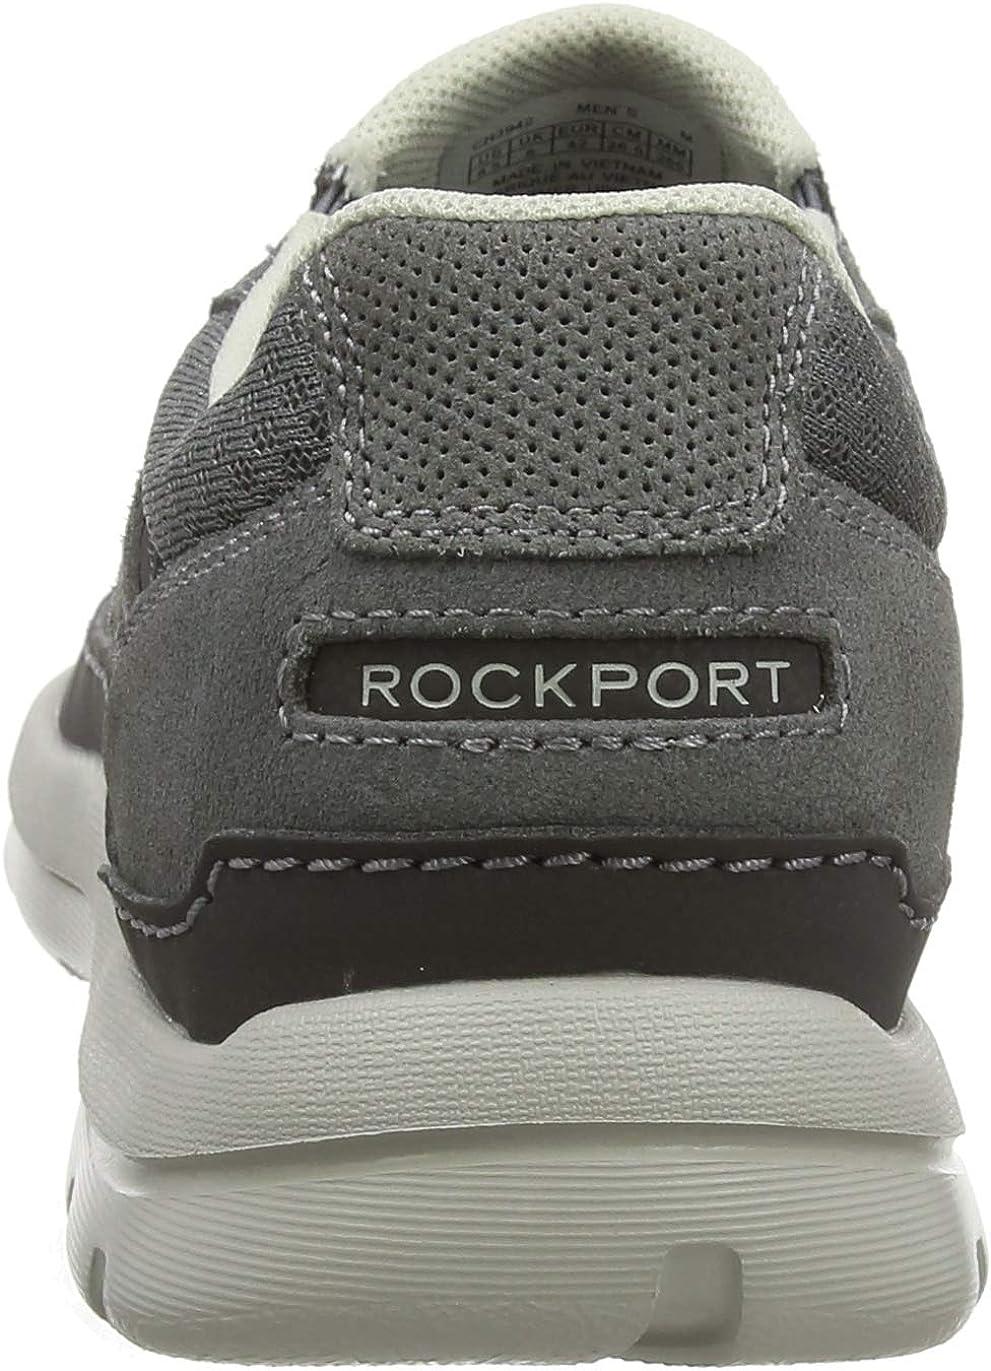 Rockport Get Your Kicks II Double Gore Richelieus Homme